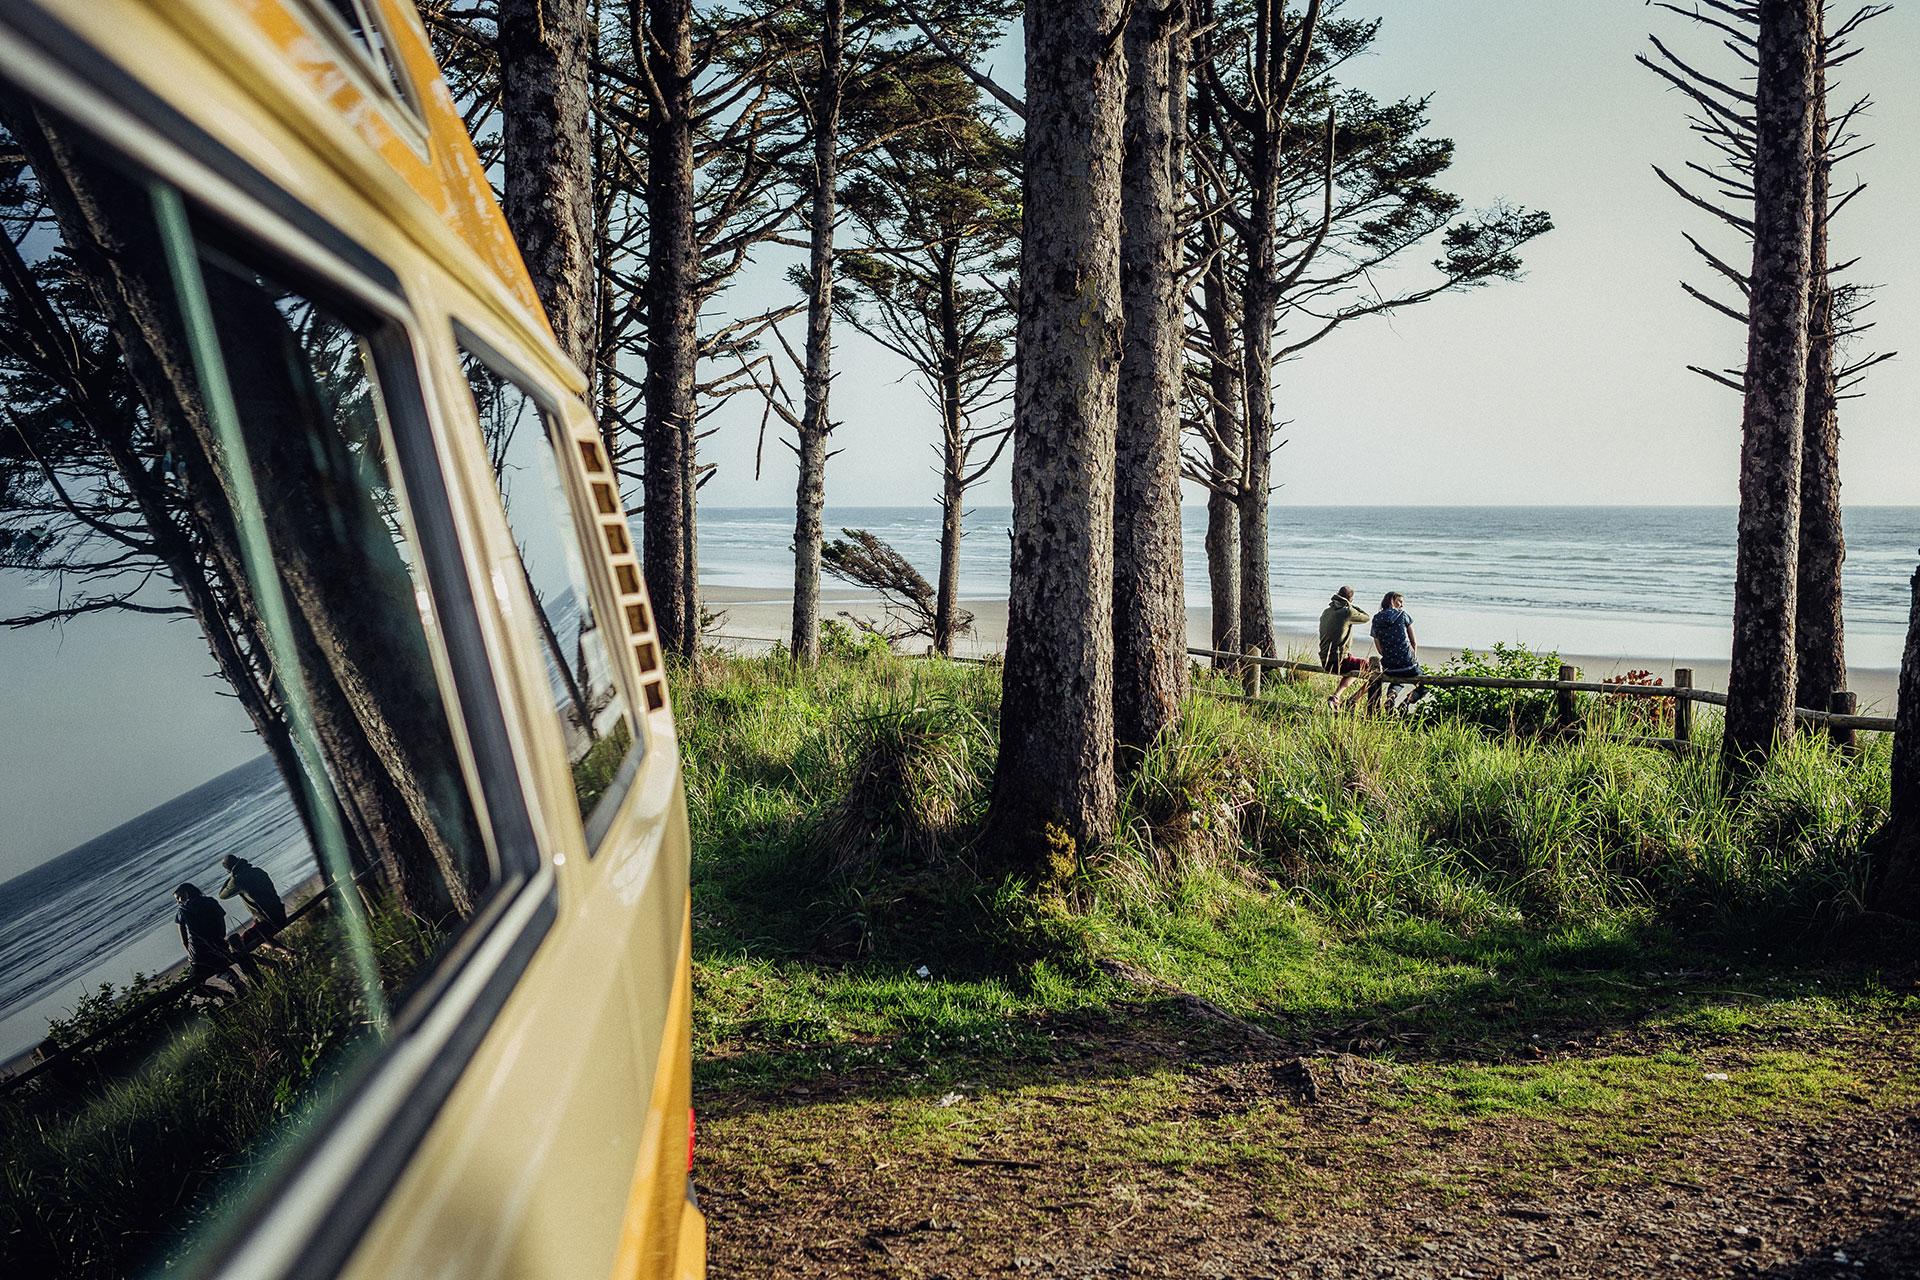 camping fotograf kueste meer oregon roadtrip zuerich schweiz